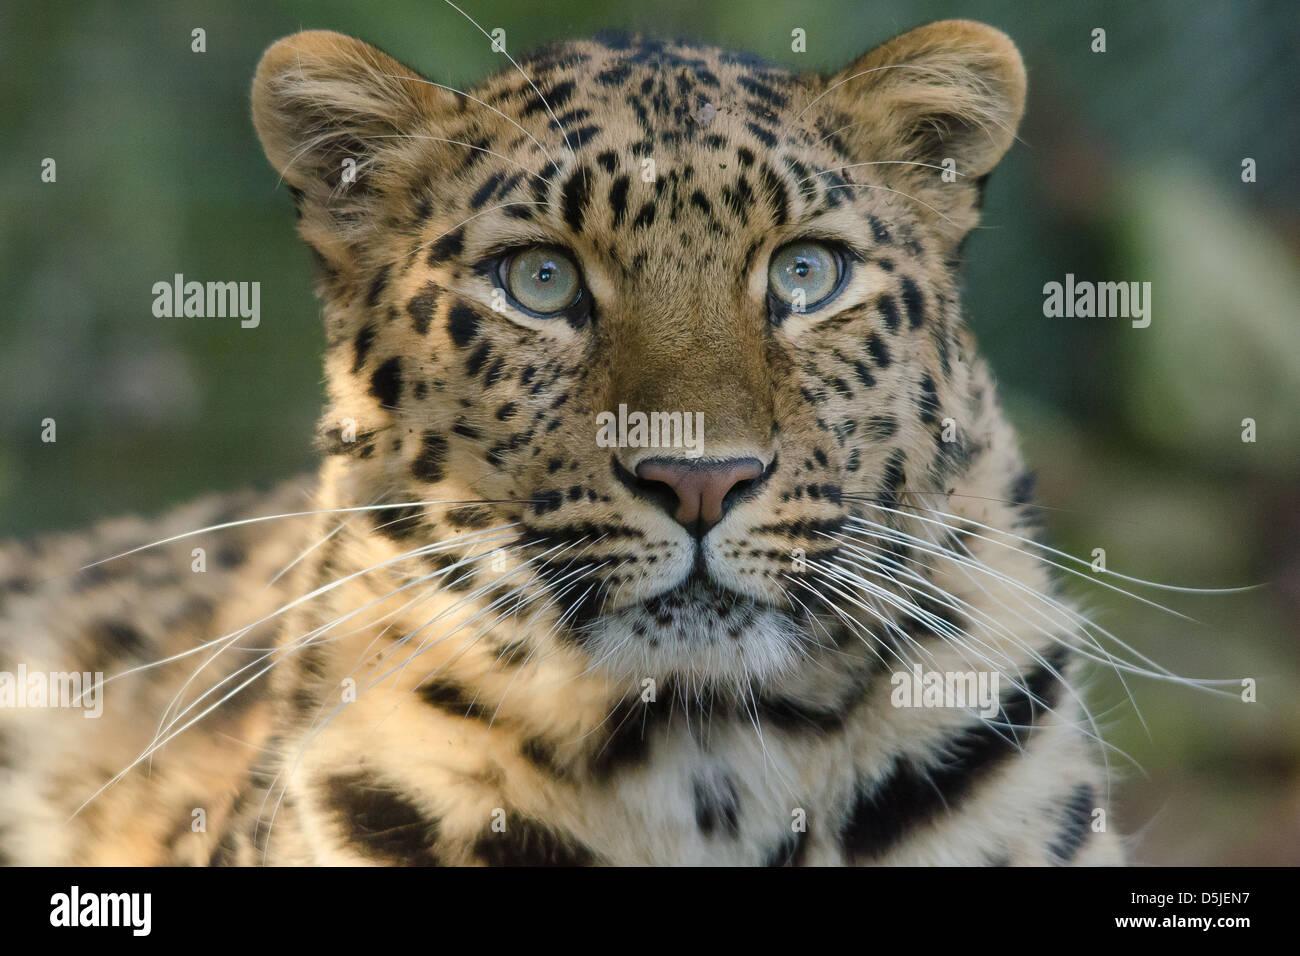 Amur Leopard head portrait - Stock Image